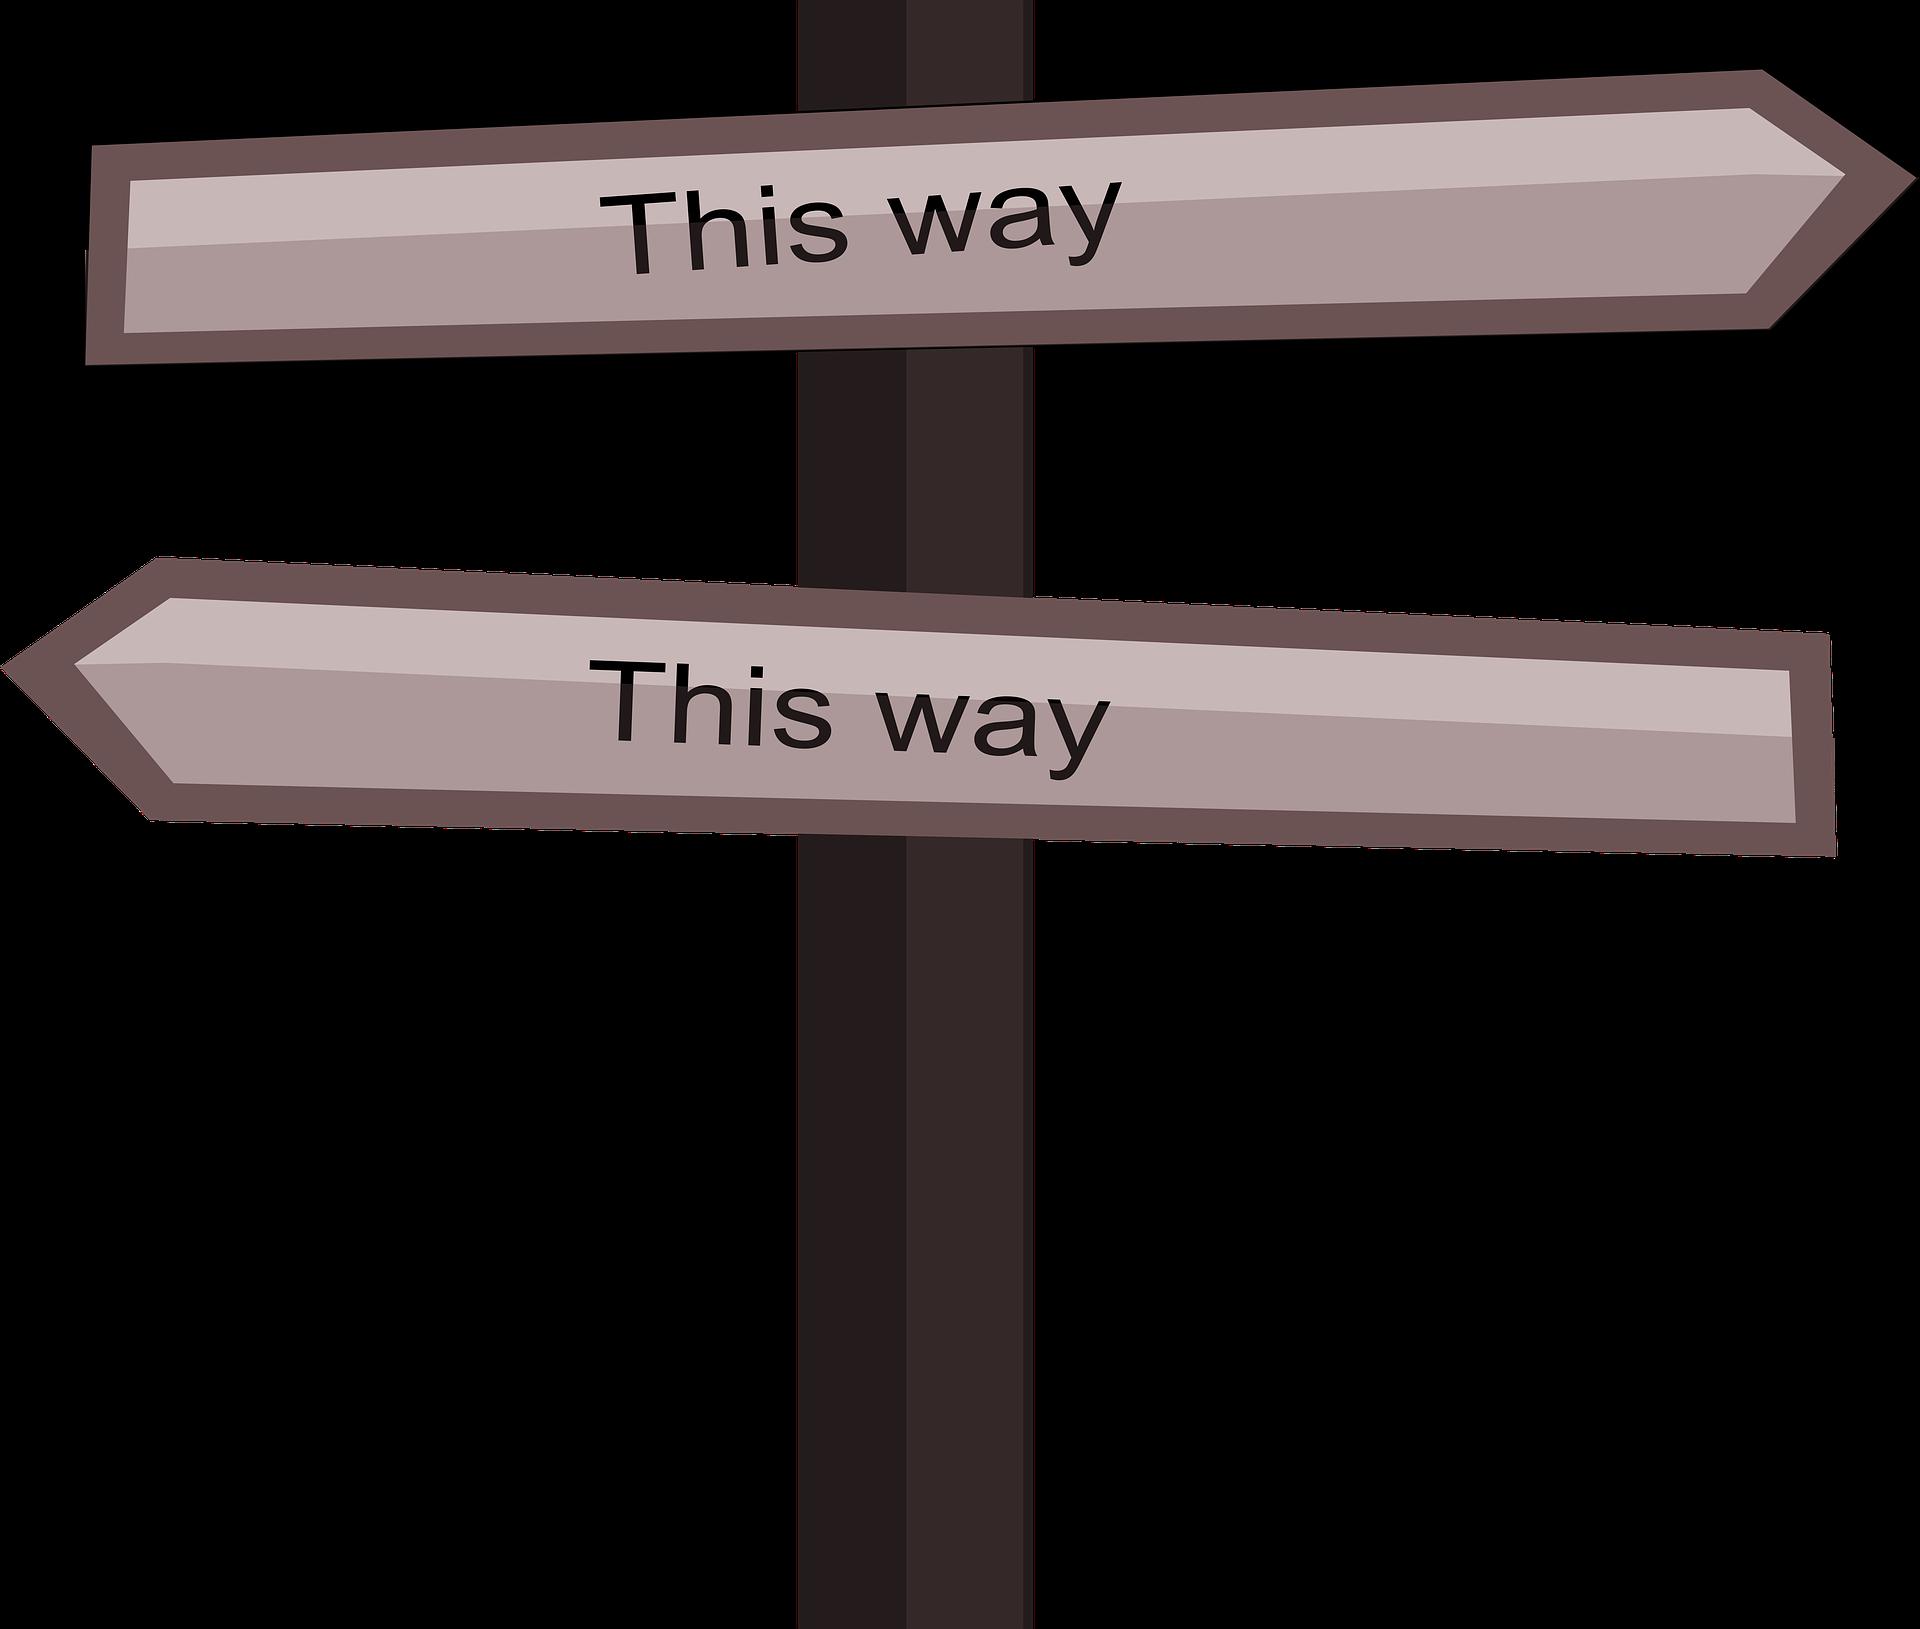 This Way 718660 1920